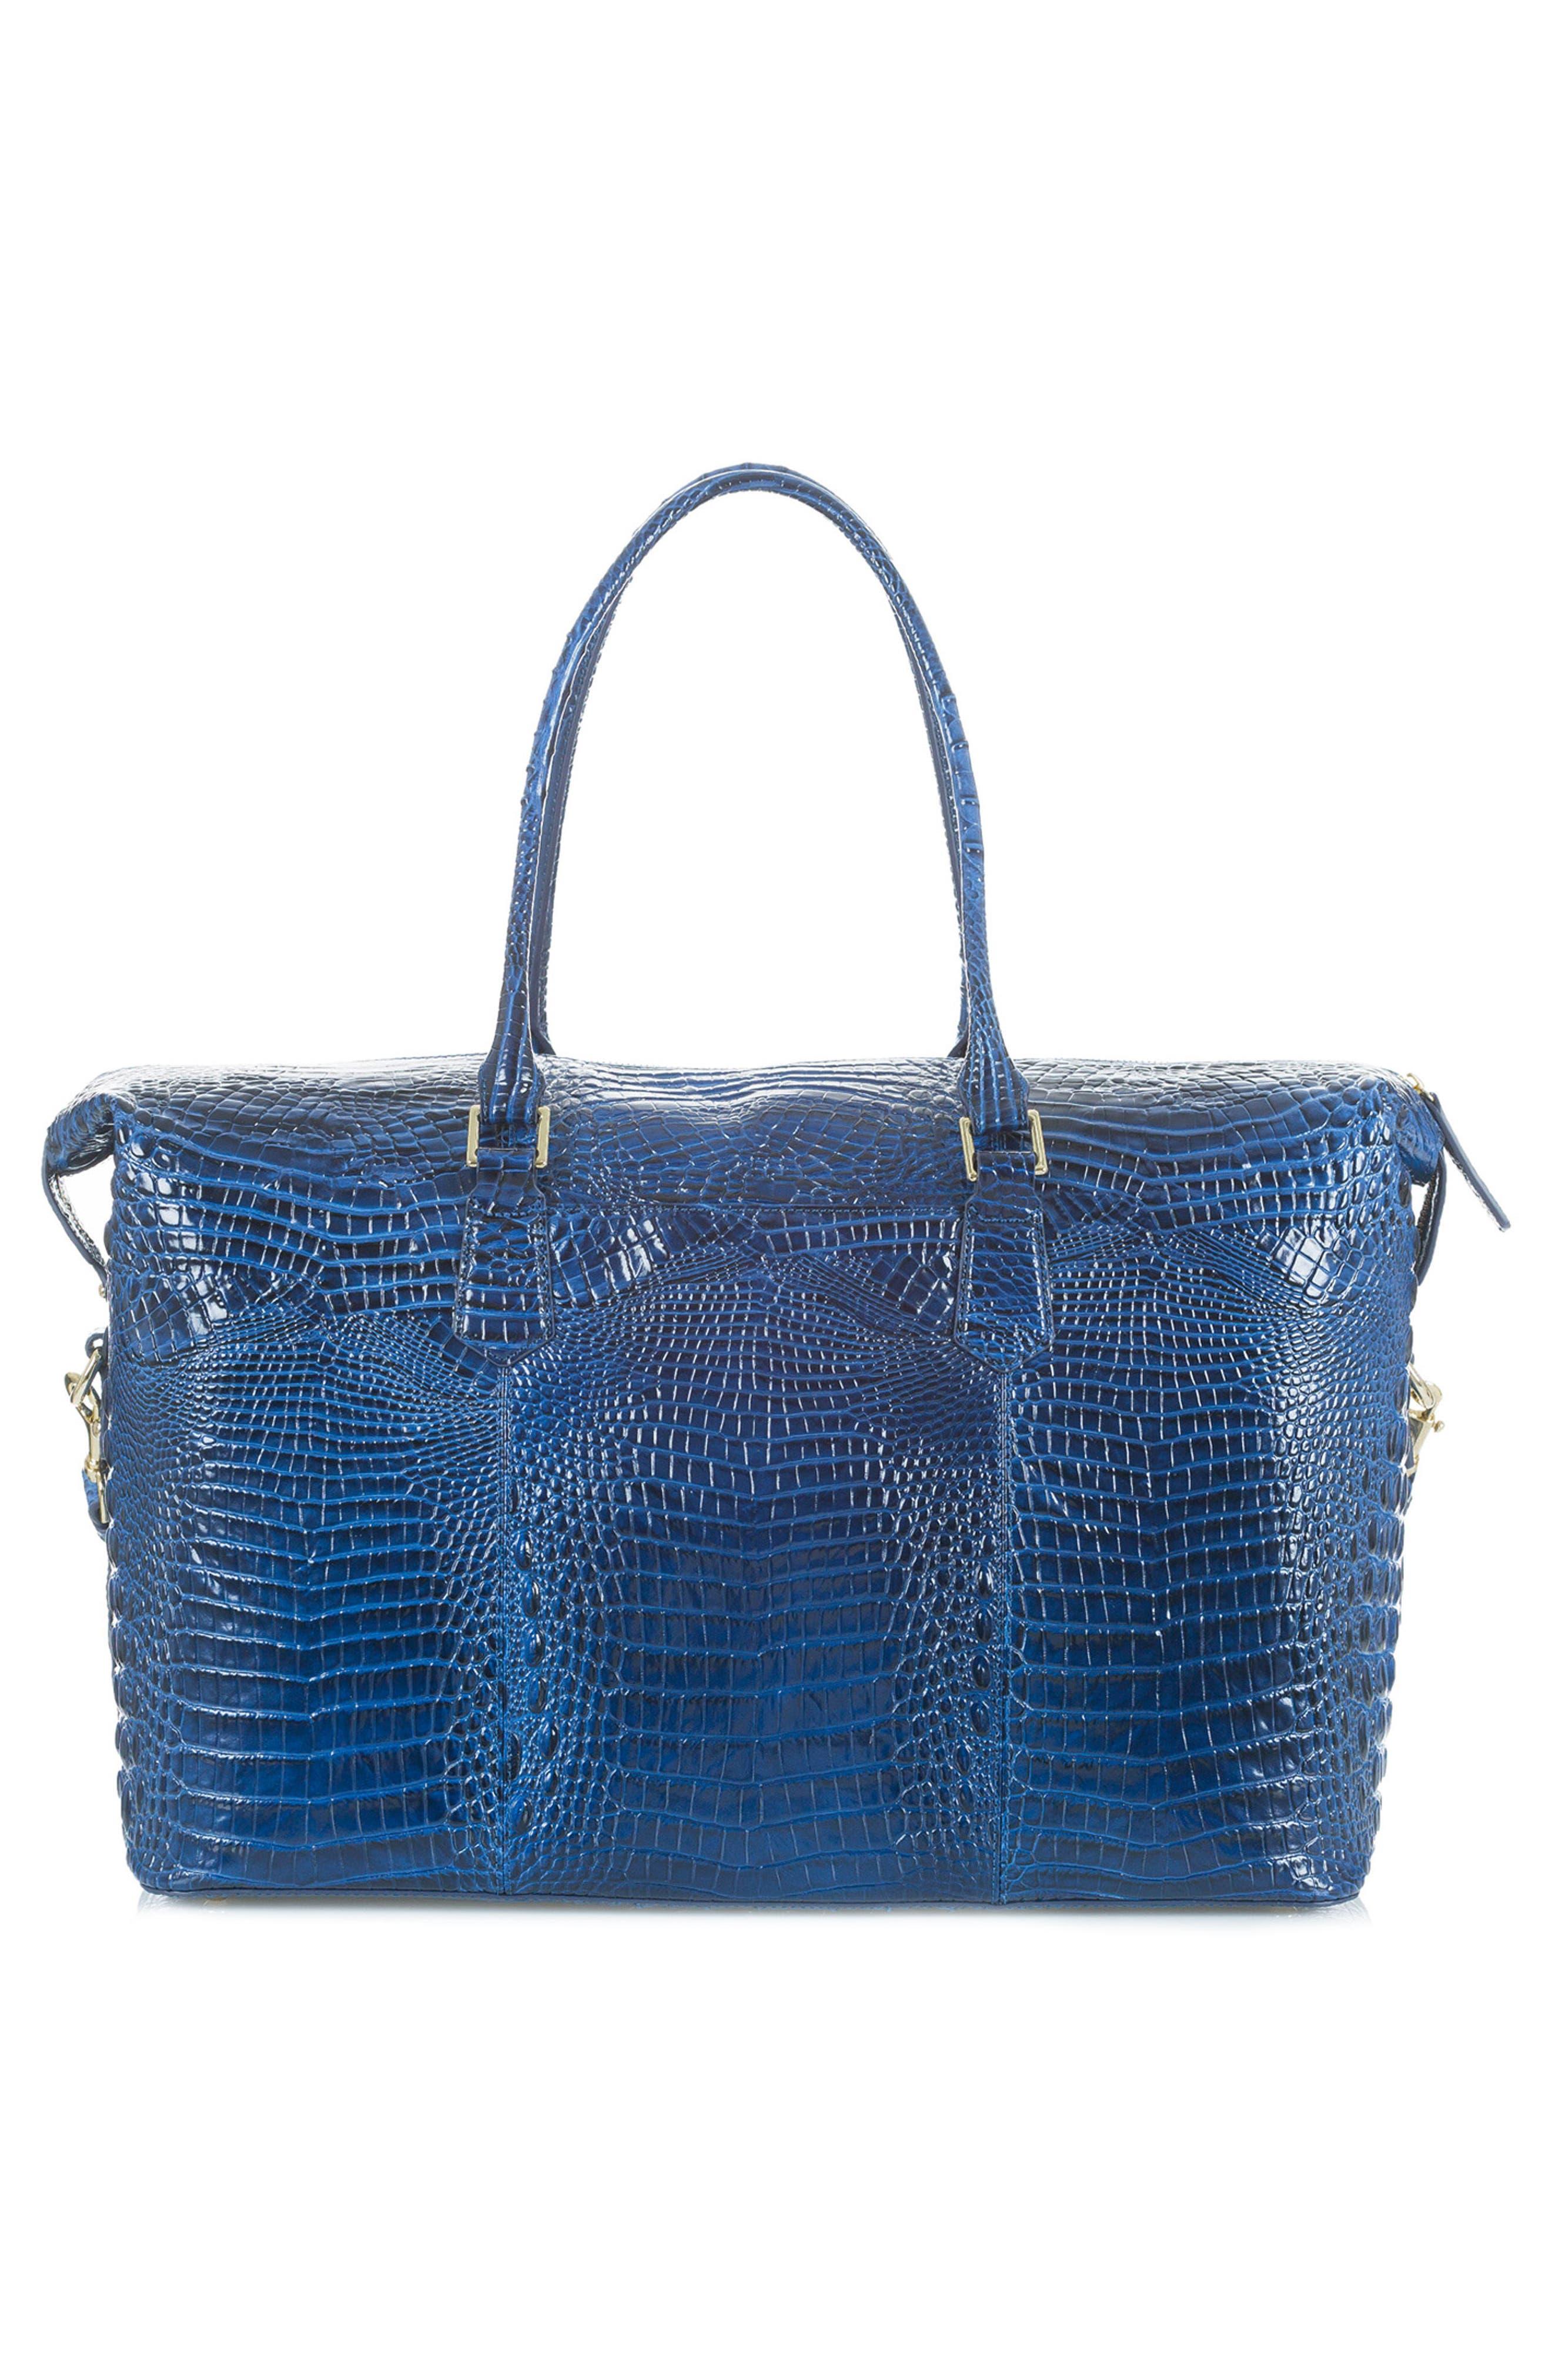 'Duxbury' Leather Travel Bag,                             Alternate thumbnail 12, color,